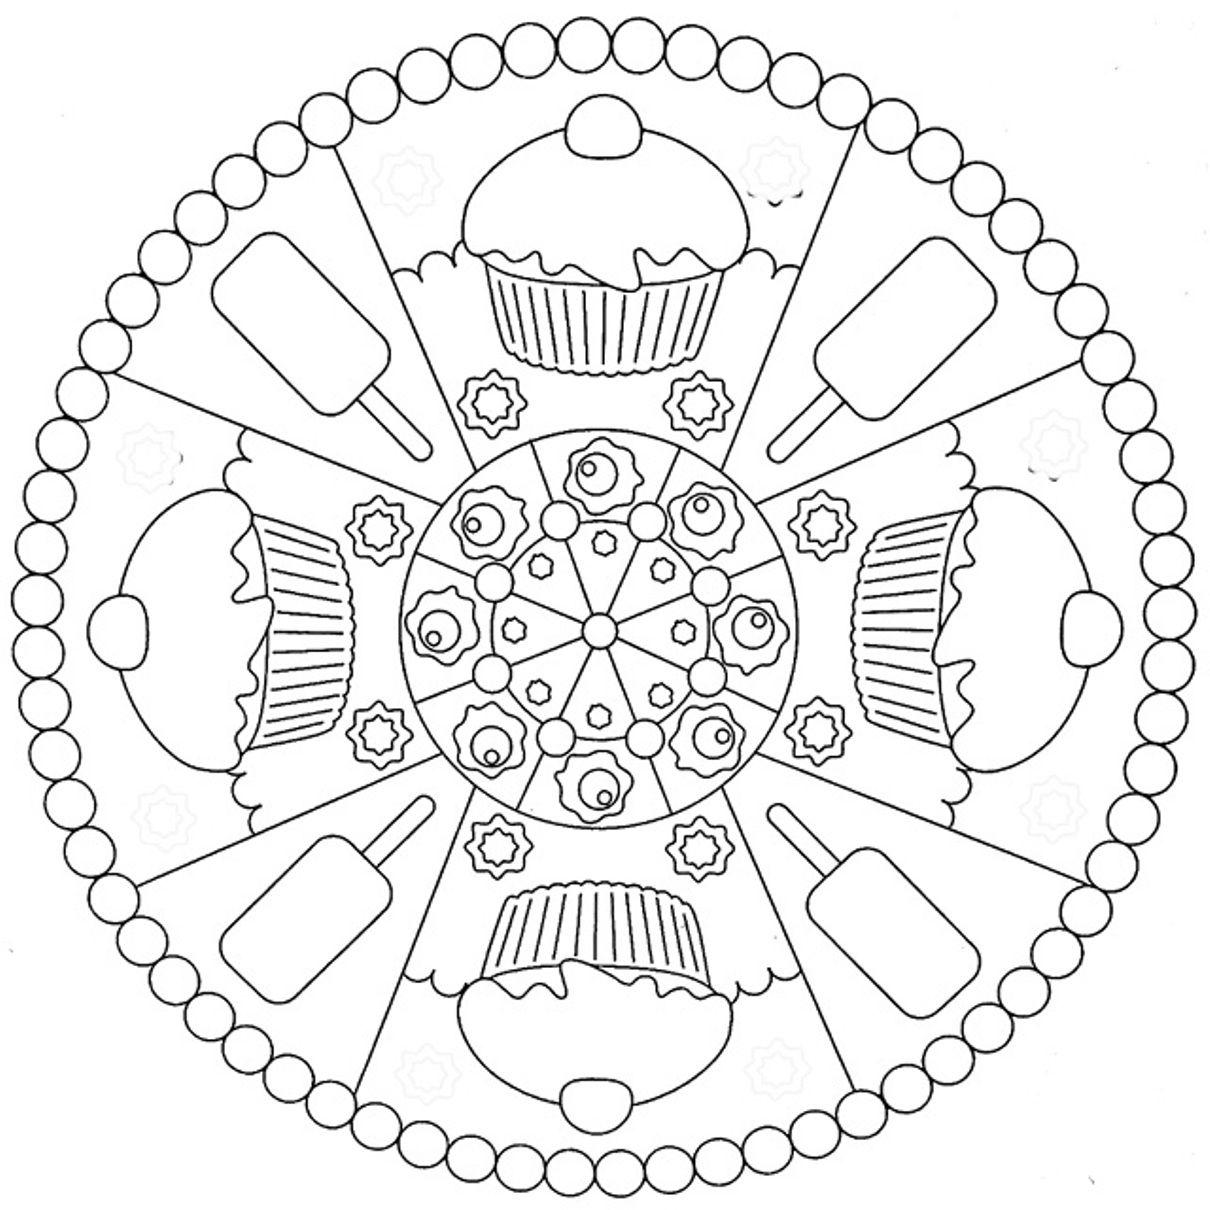 Cookies And Ice Cream Mandala Coloring Pages | Kleurplaten ...